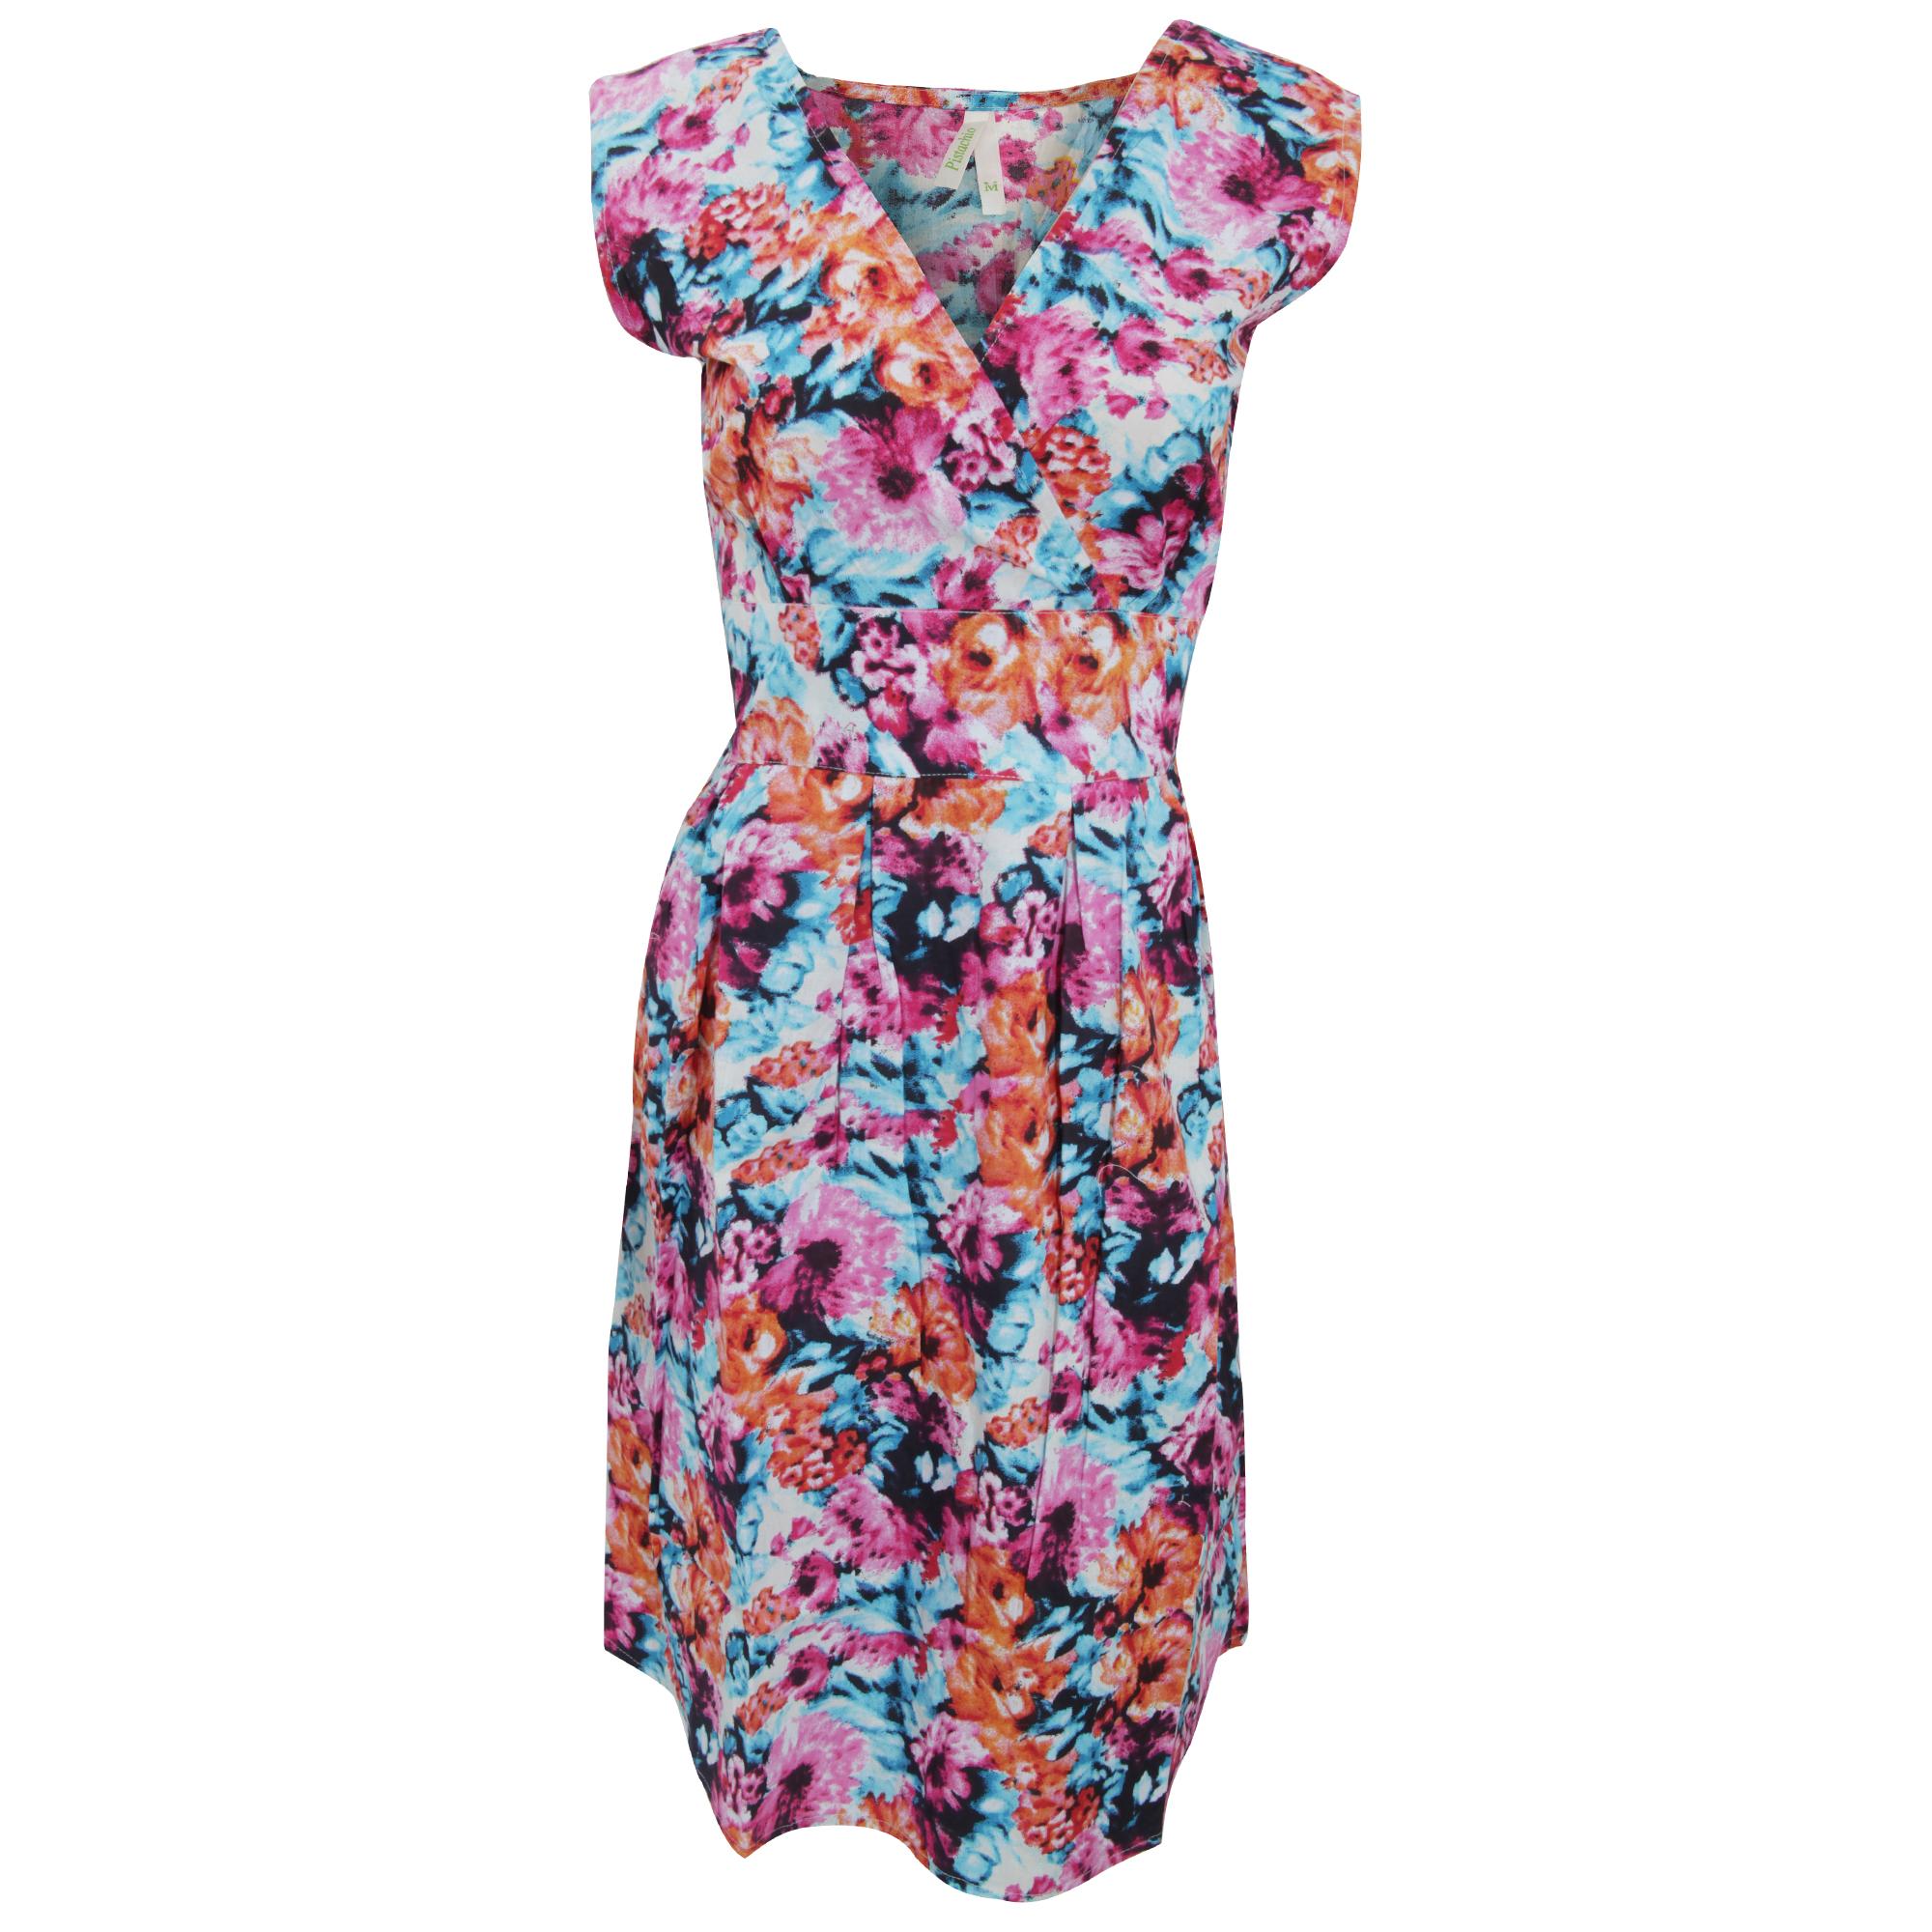 Womens/Ladies Floral Print Sleeveless Cotton Summer Dress ...